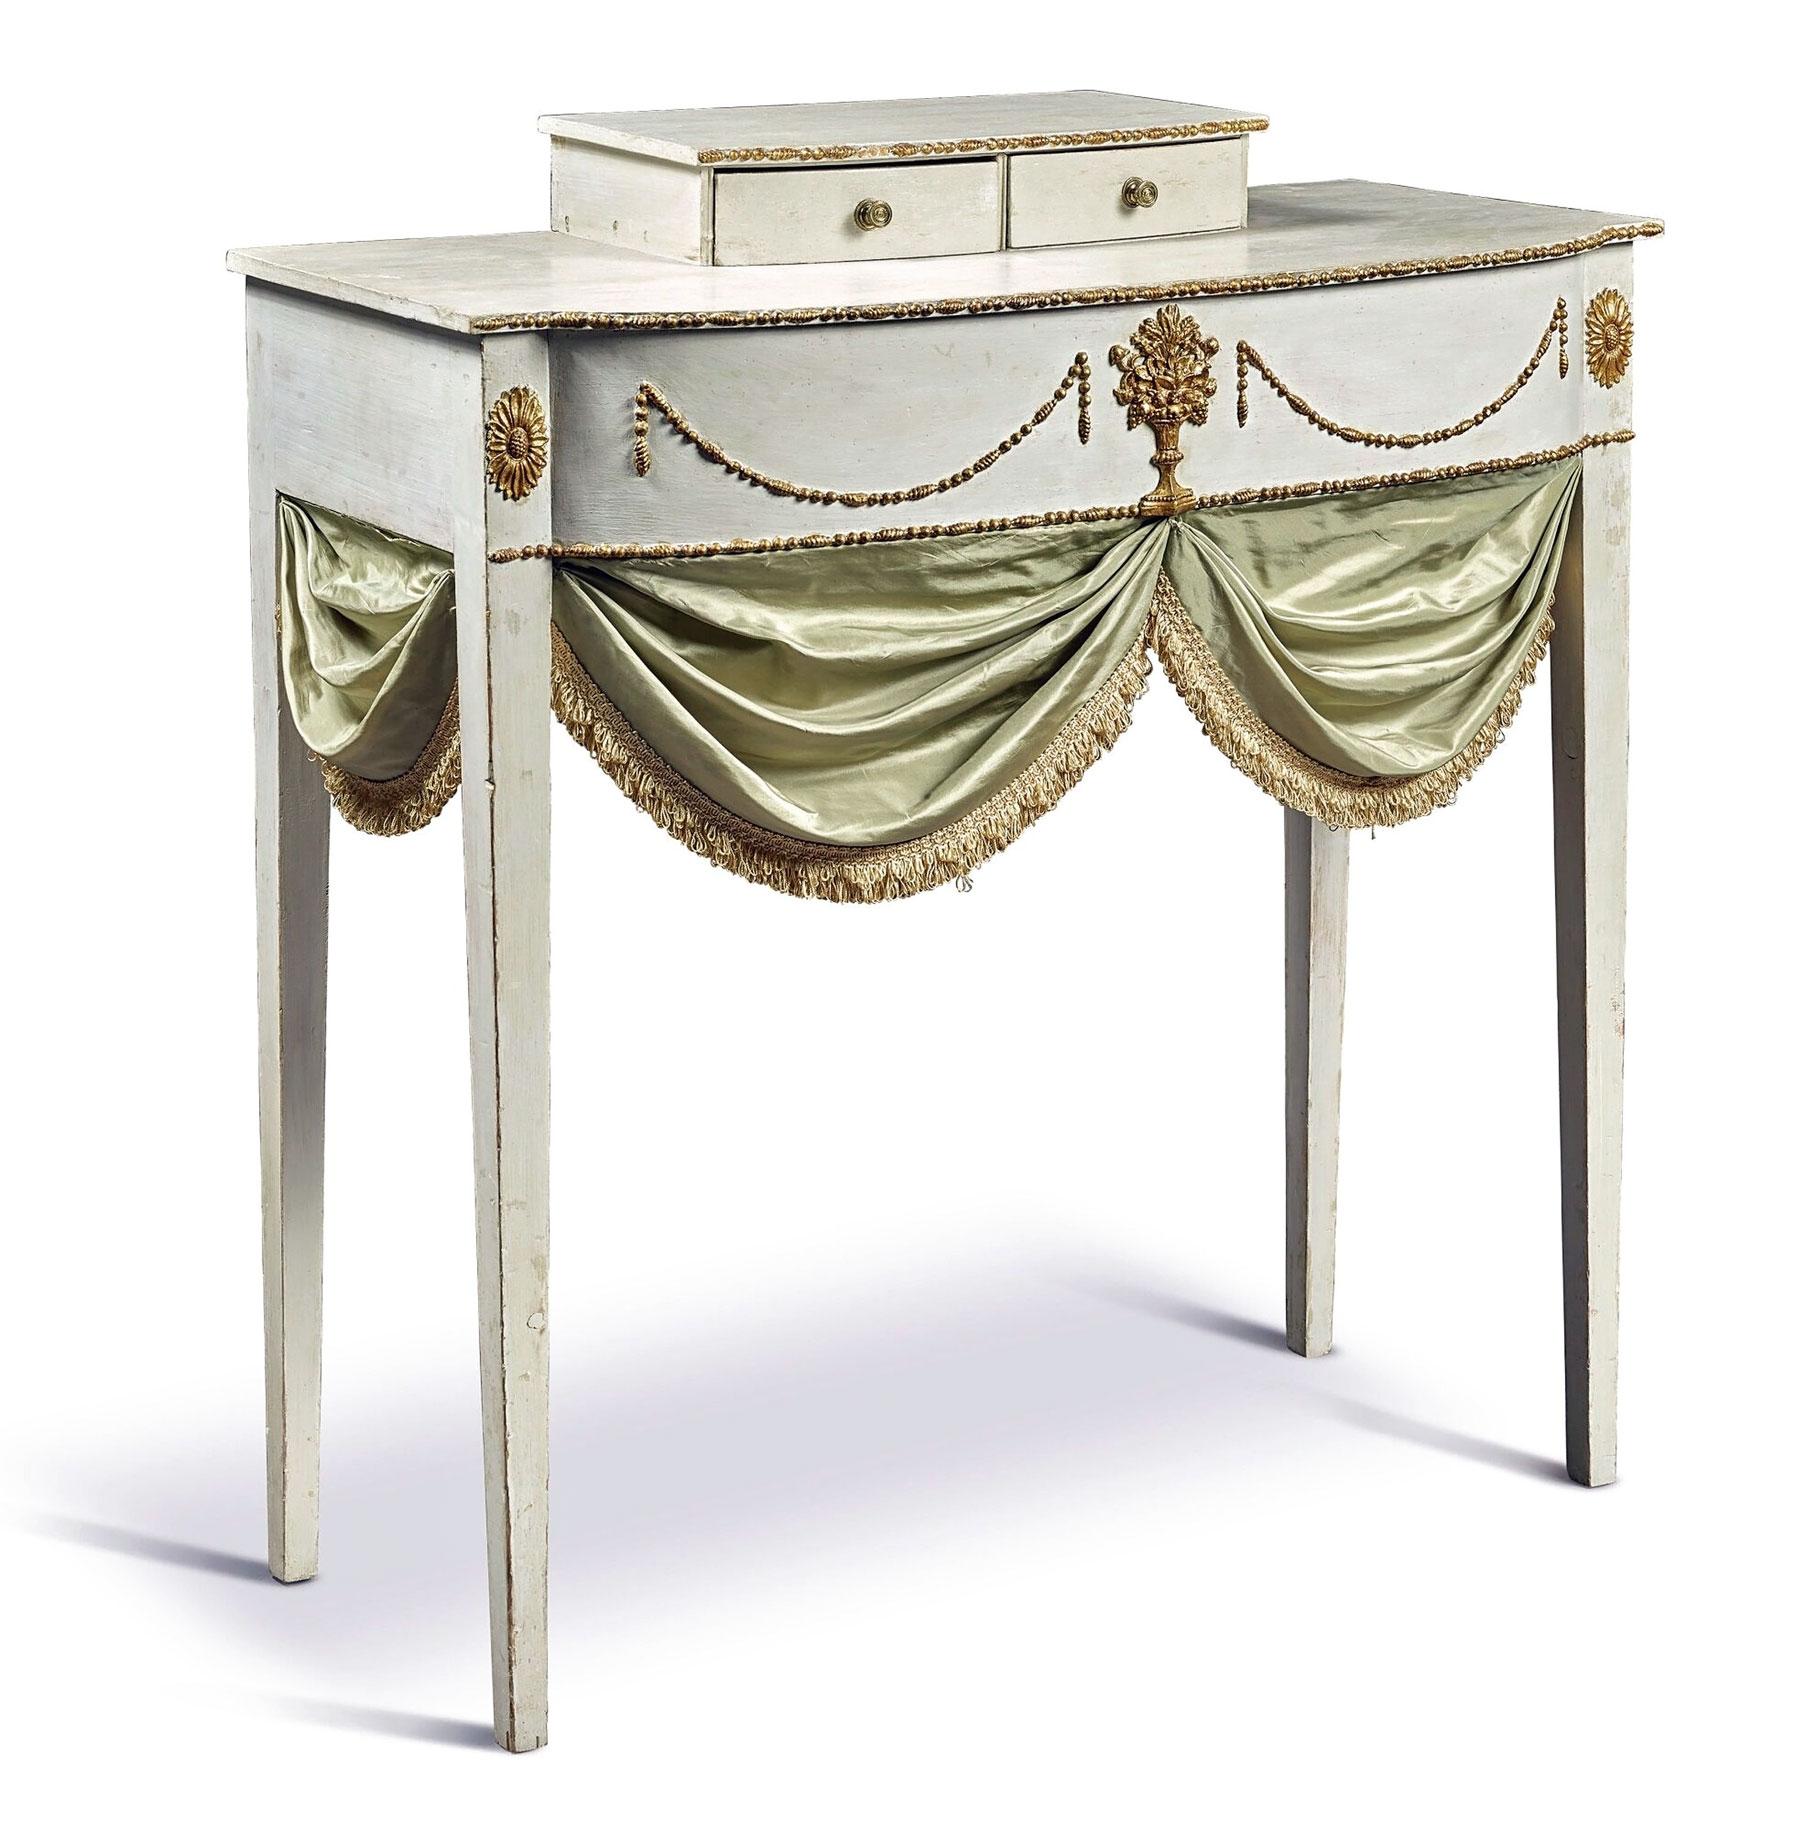 Dressing table, attributed to John Doggett (1780-1857) and Stillman Lathrop (d. 1853), Salem, Massachusetts, c. 1805